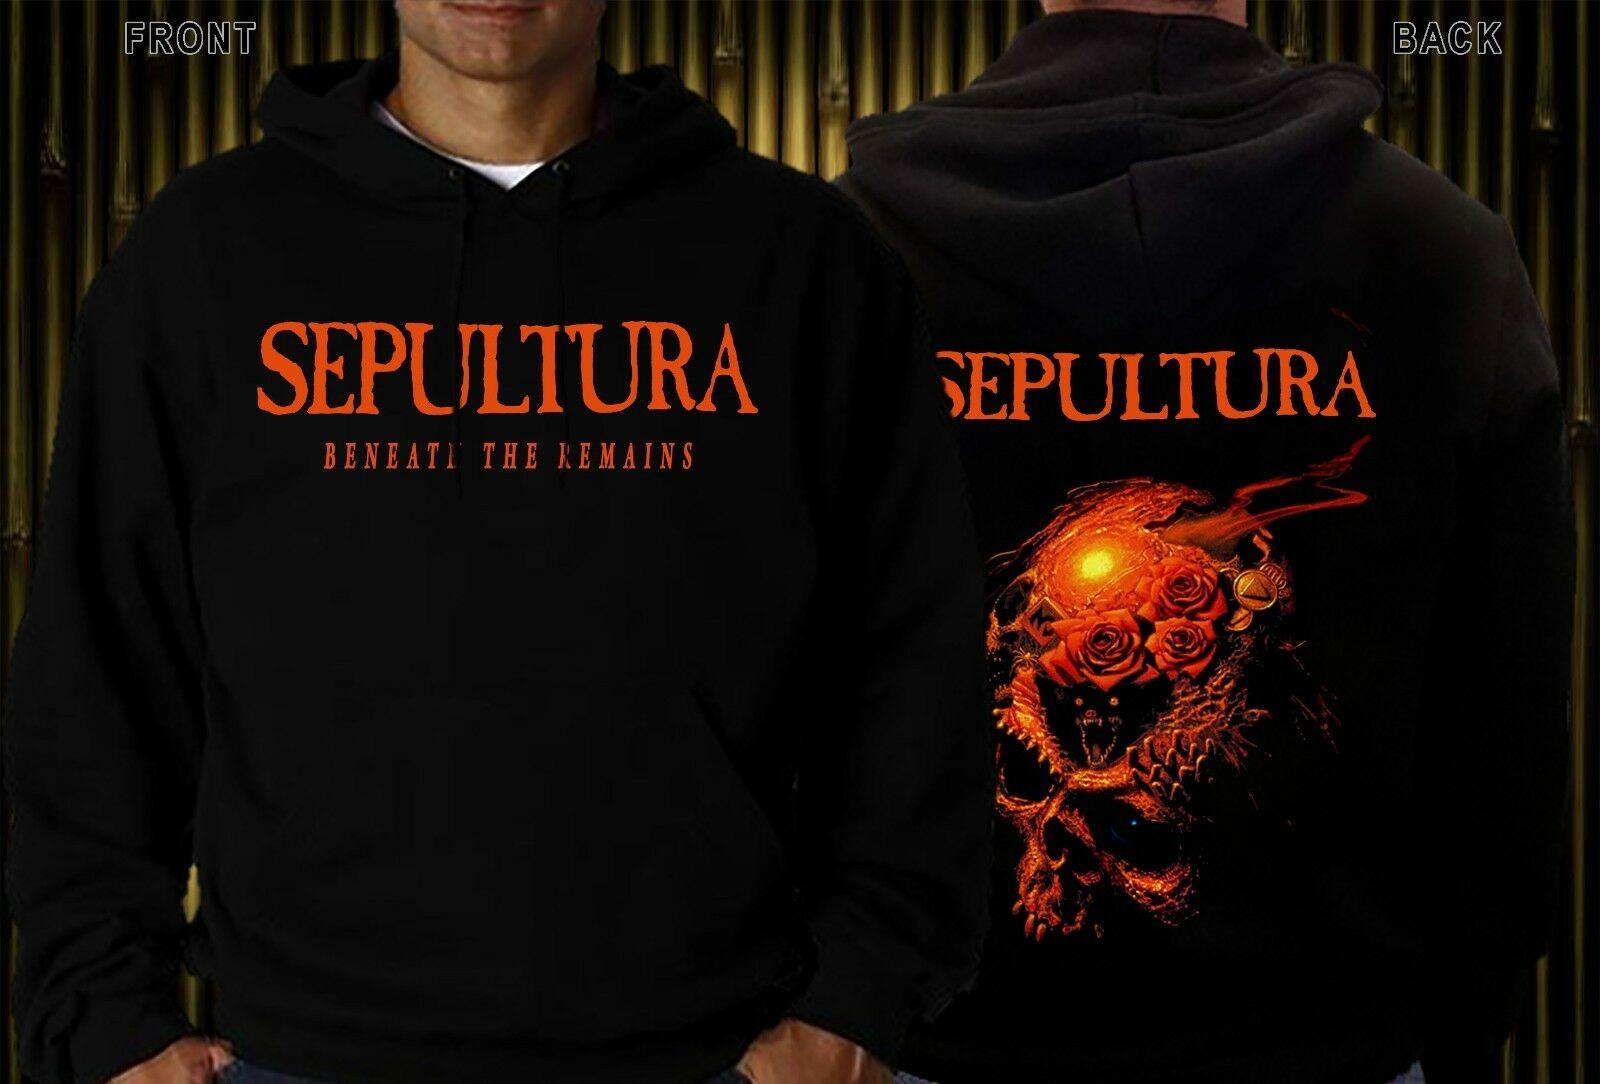 Sepultura sob o ainda-canal de metal south kreator, hoodie & swearshirt-tamanhos s a xxl